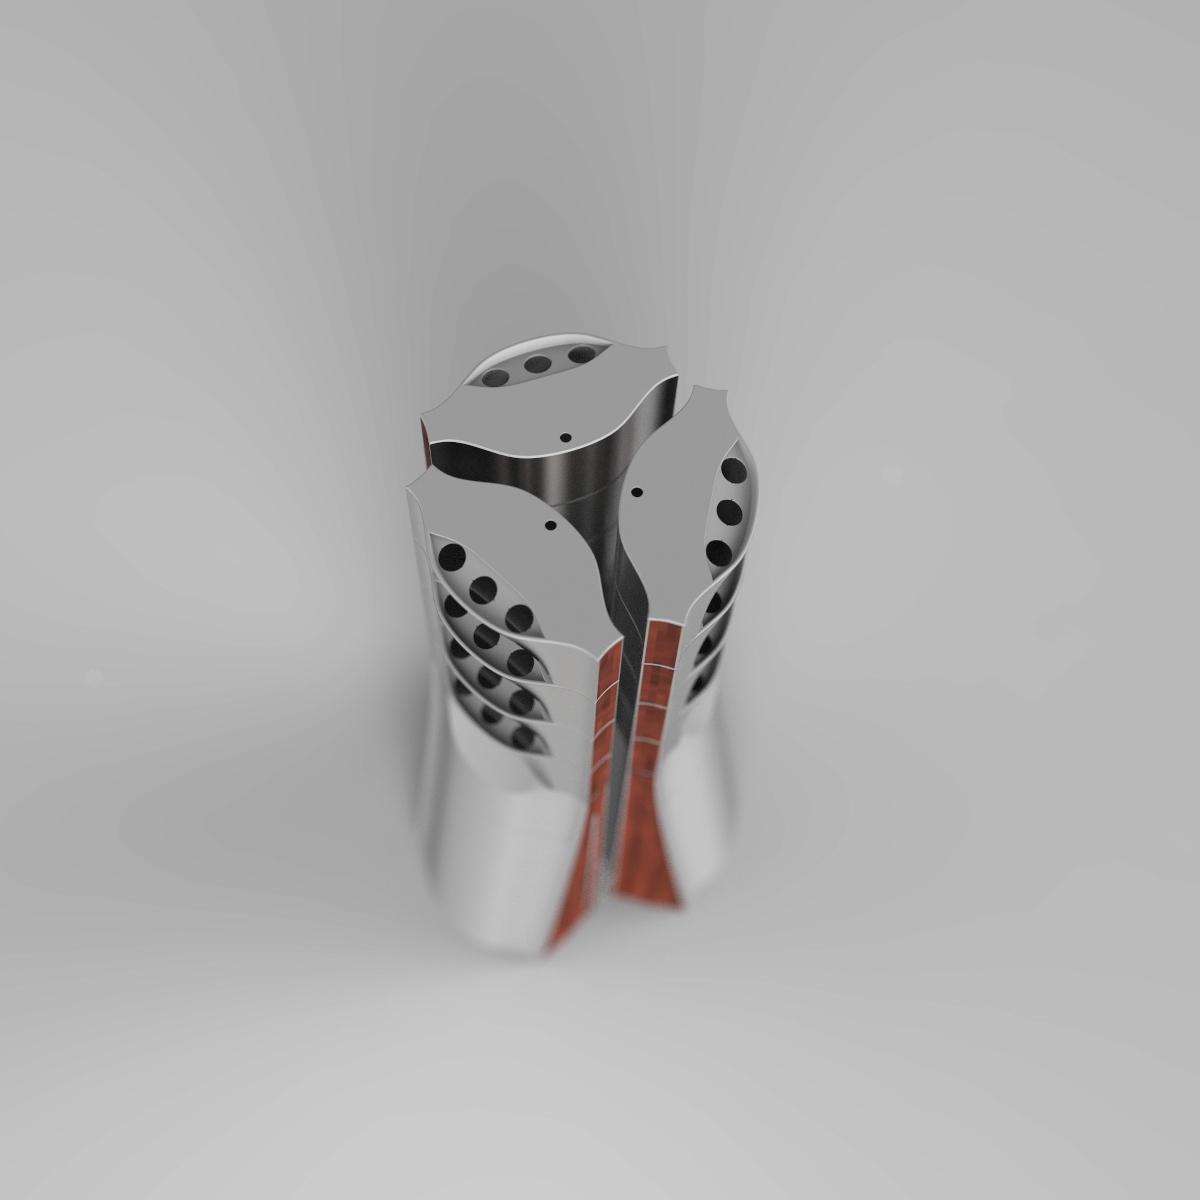 gaia-prototype-4-sq.jpg